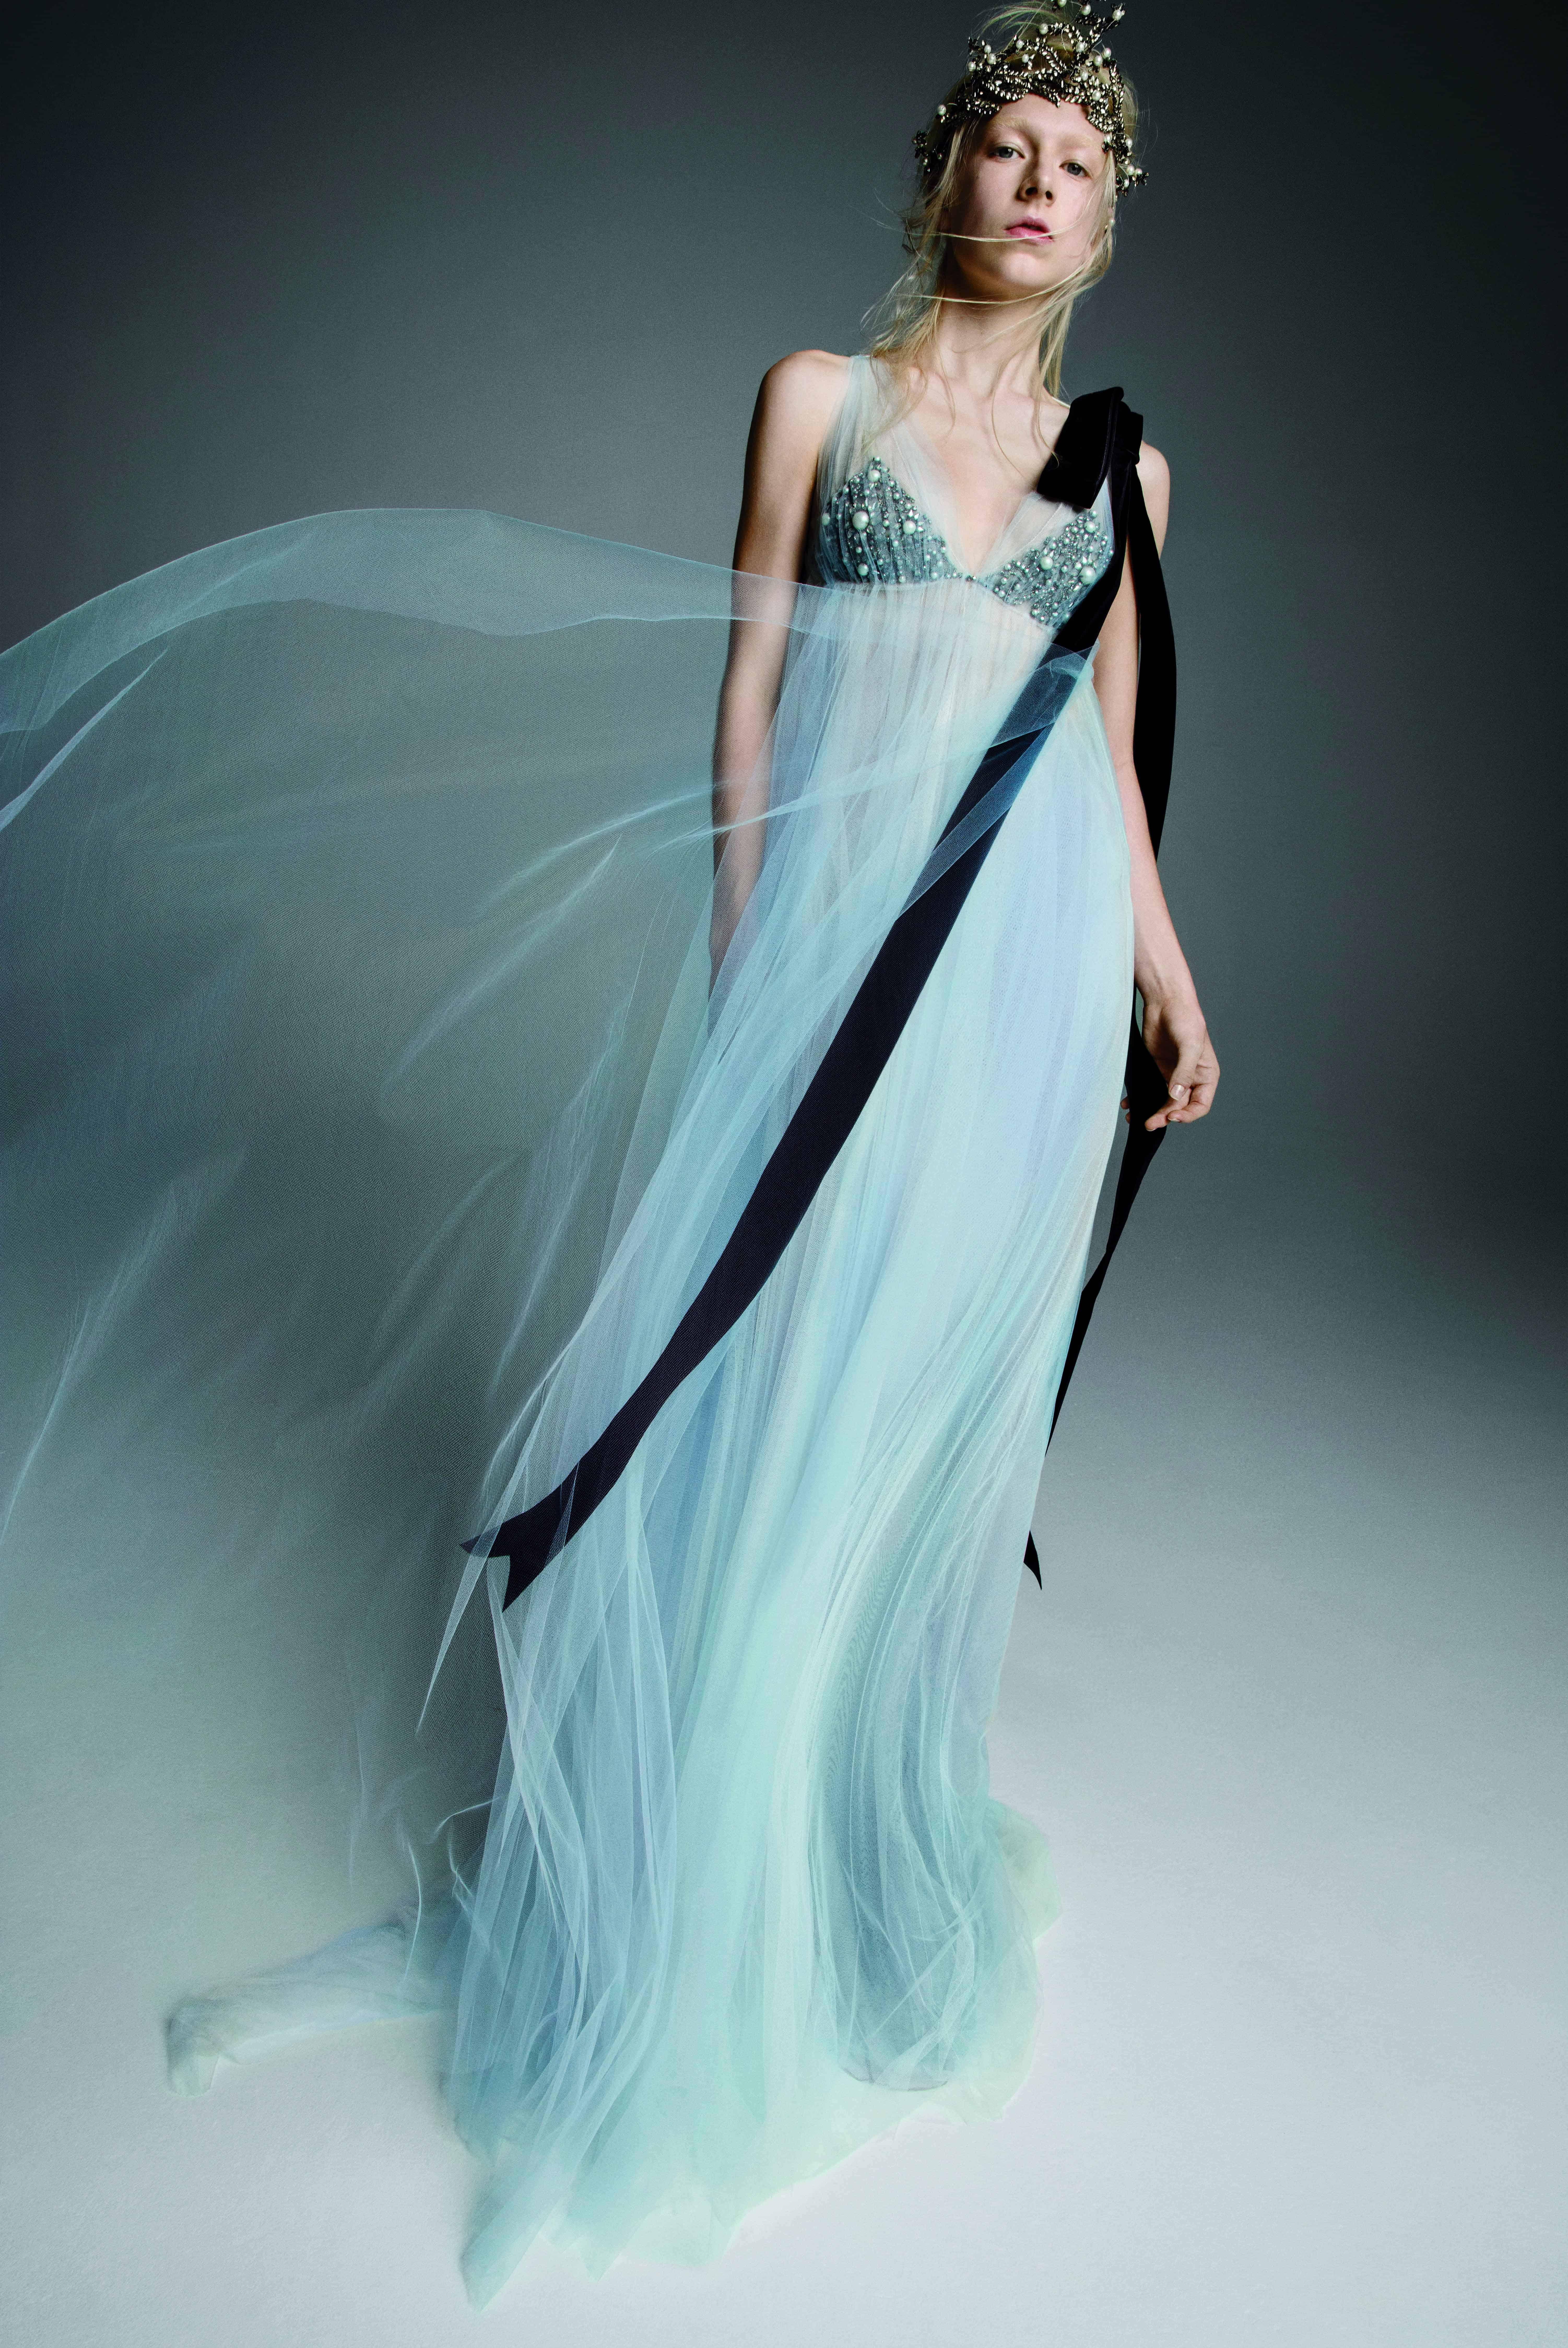 wedding dress collection fall 2019 by Vera Wang